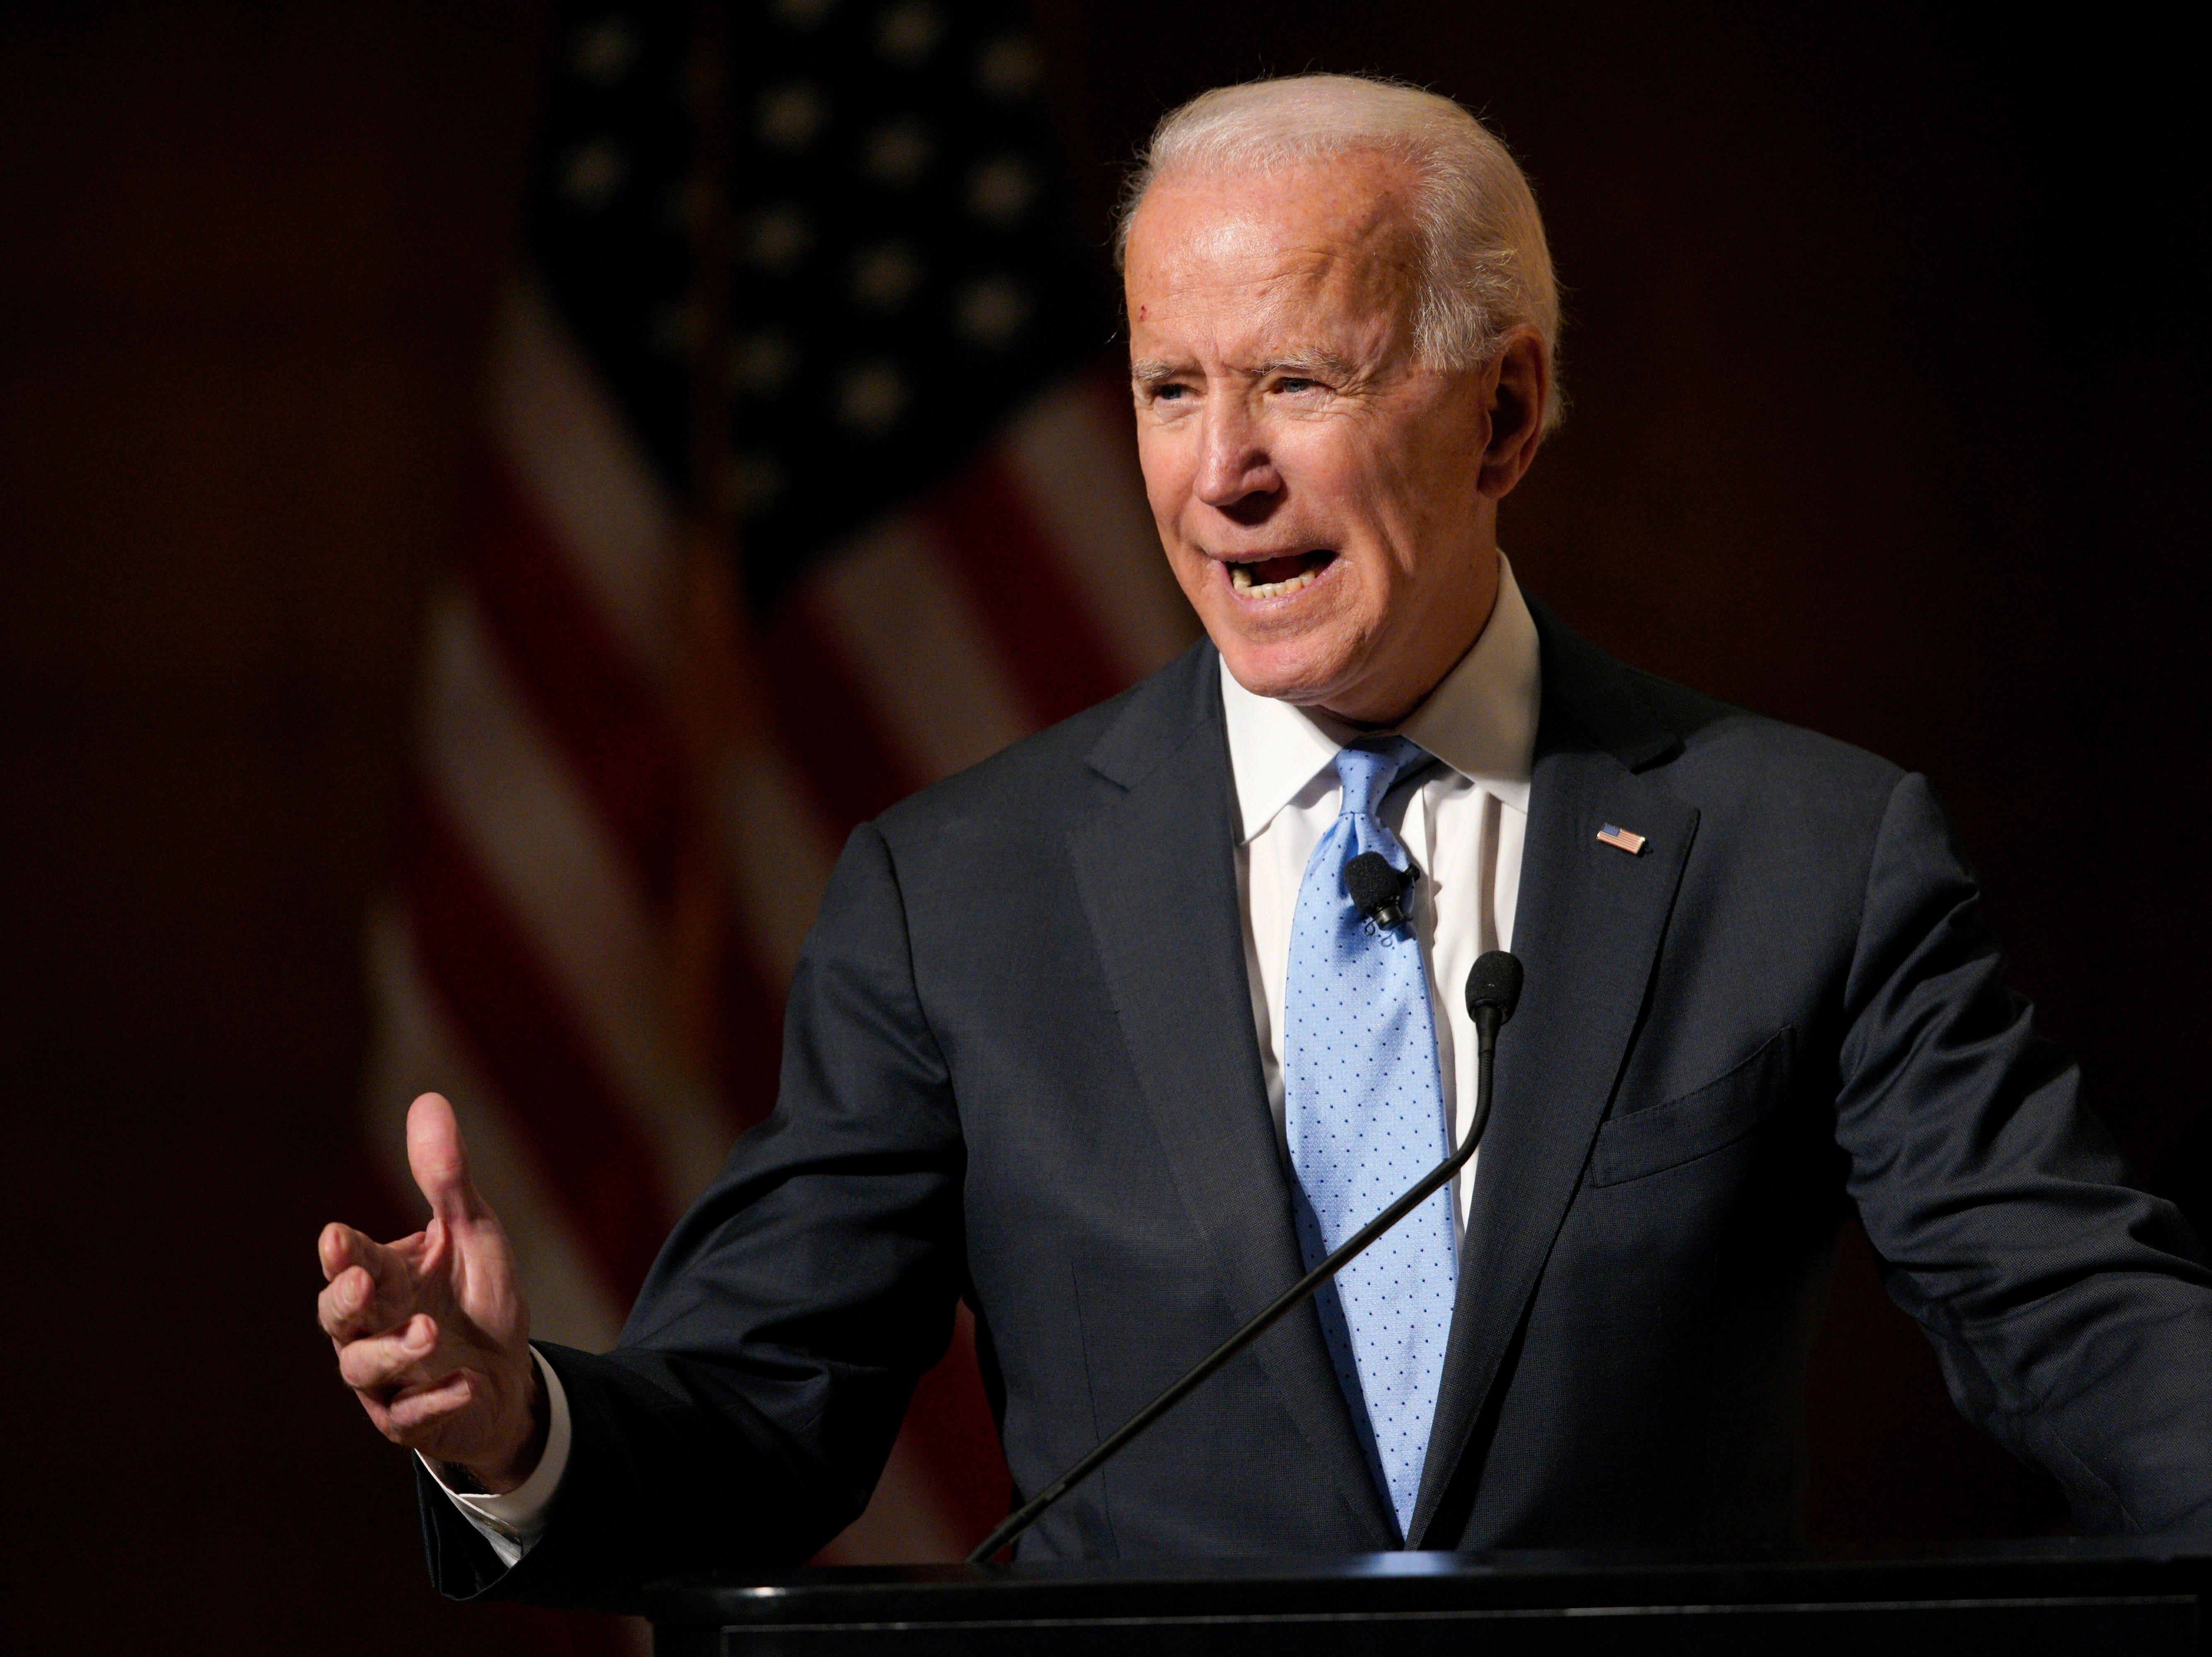 Joe Biden eyes fundraising challenge amid new sense of urgency